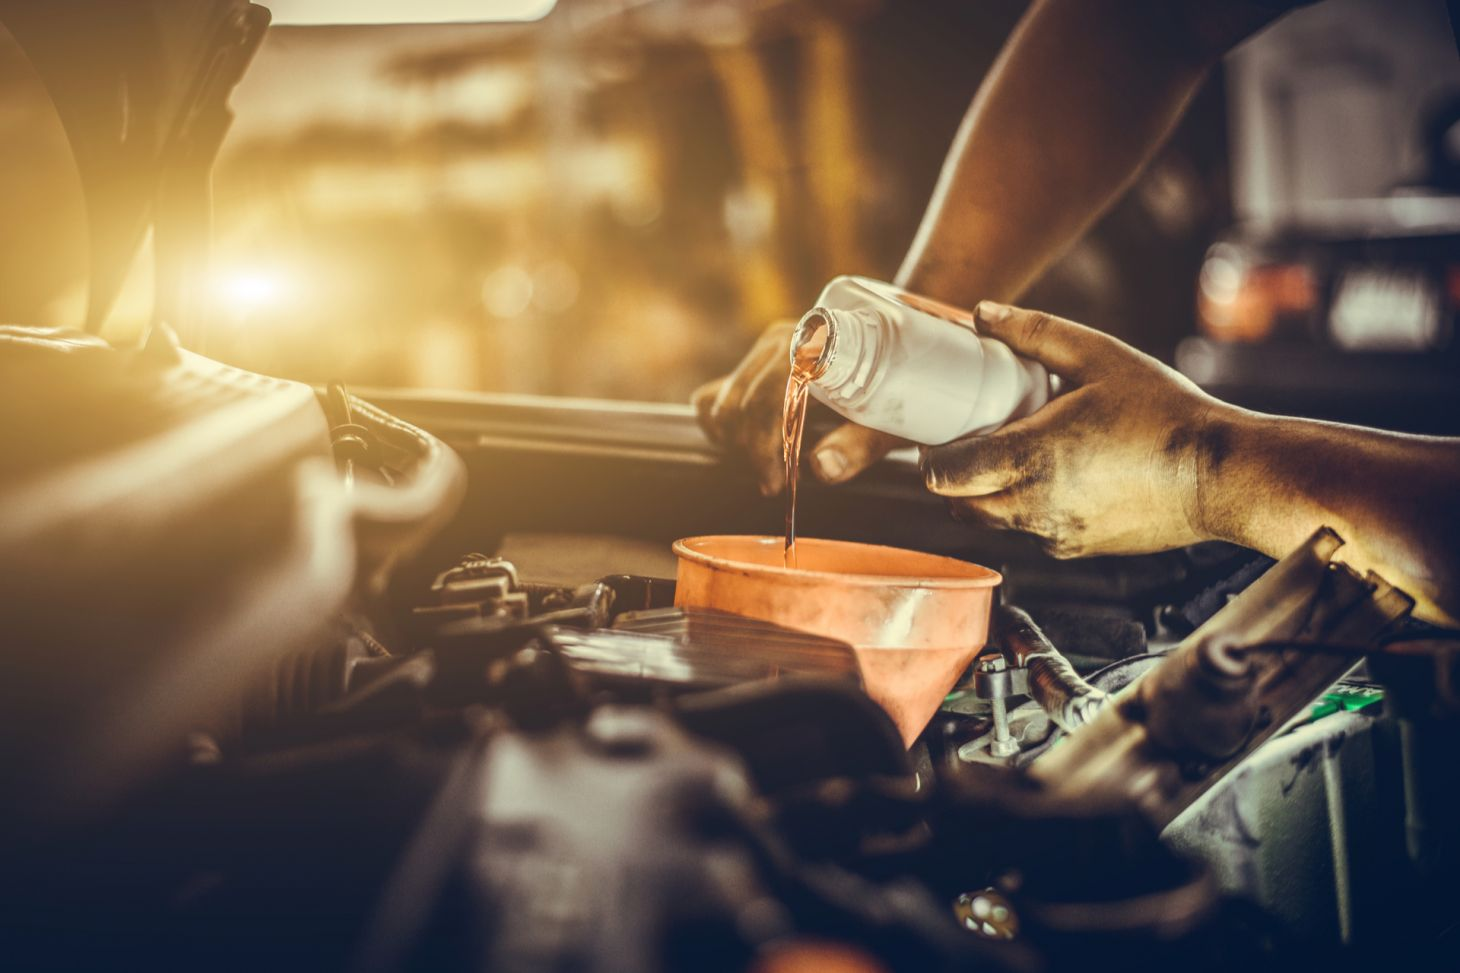 mecanico especialista trocando oleo motor carro